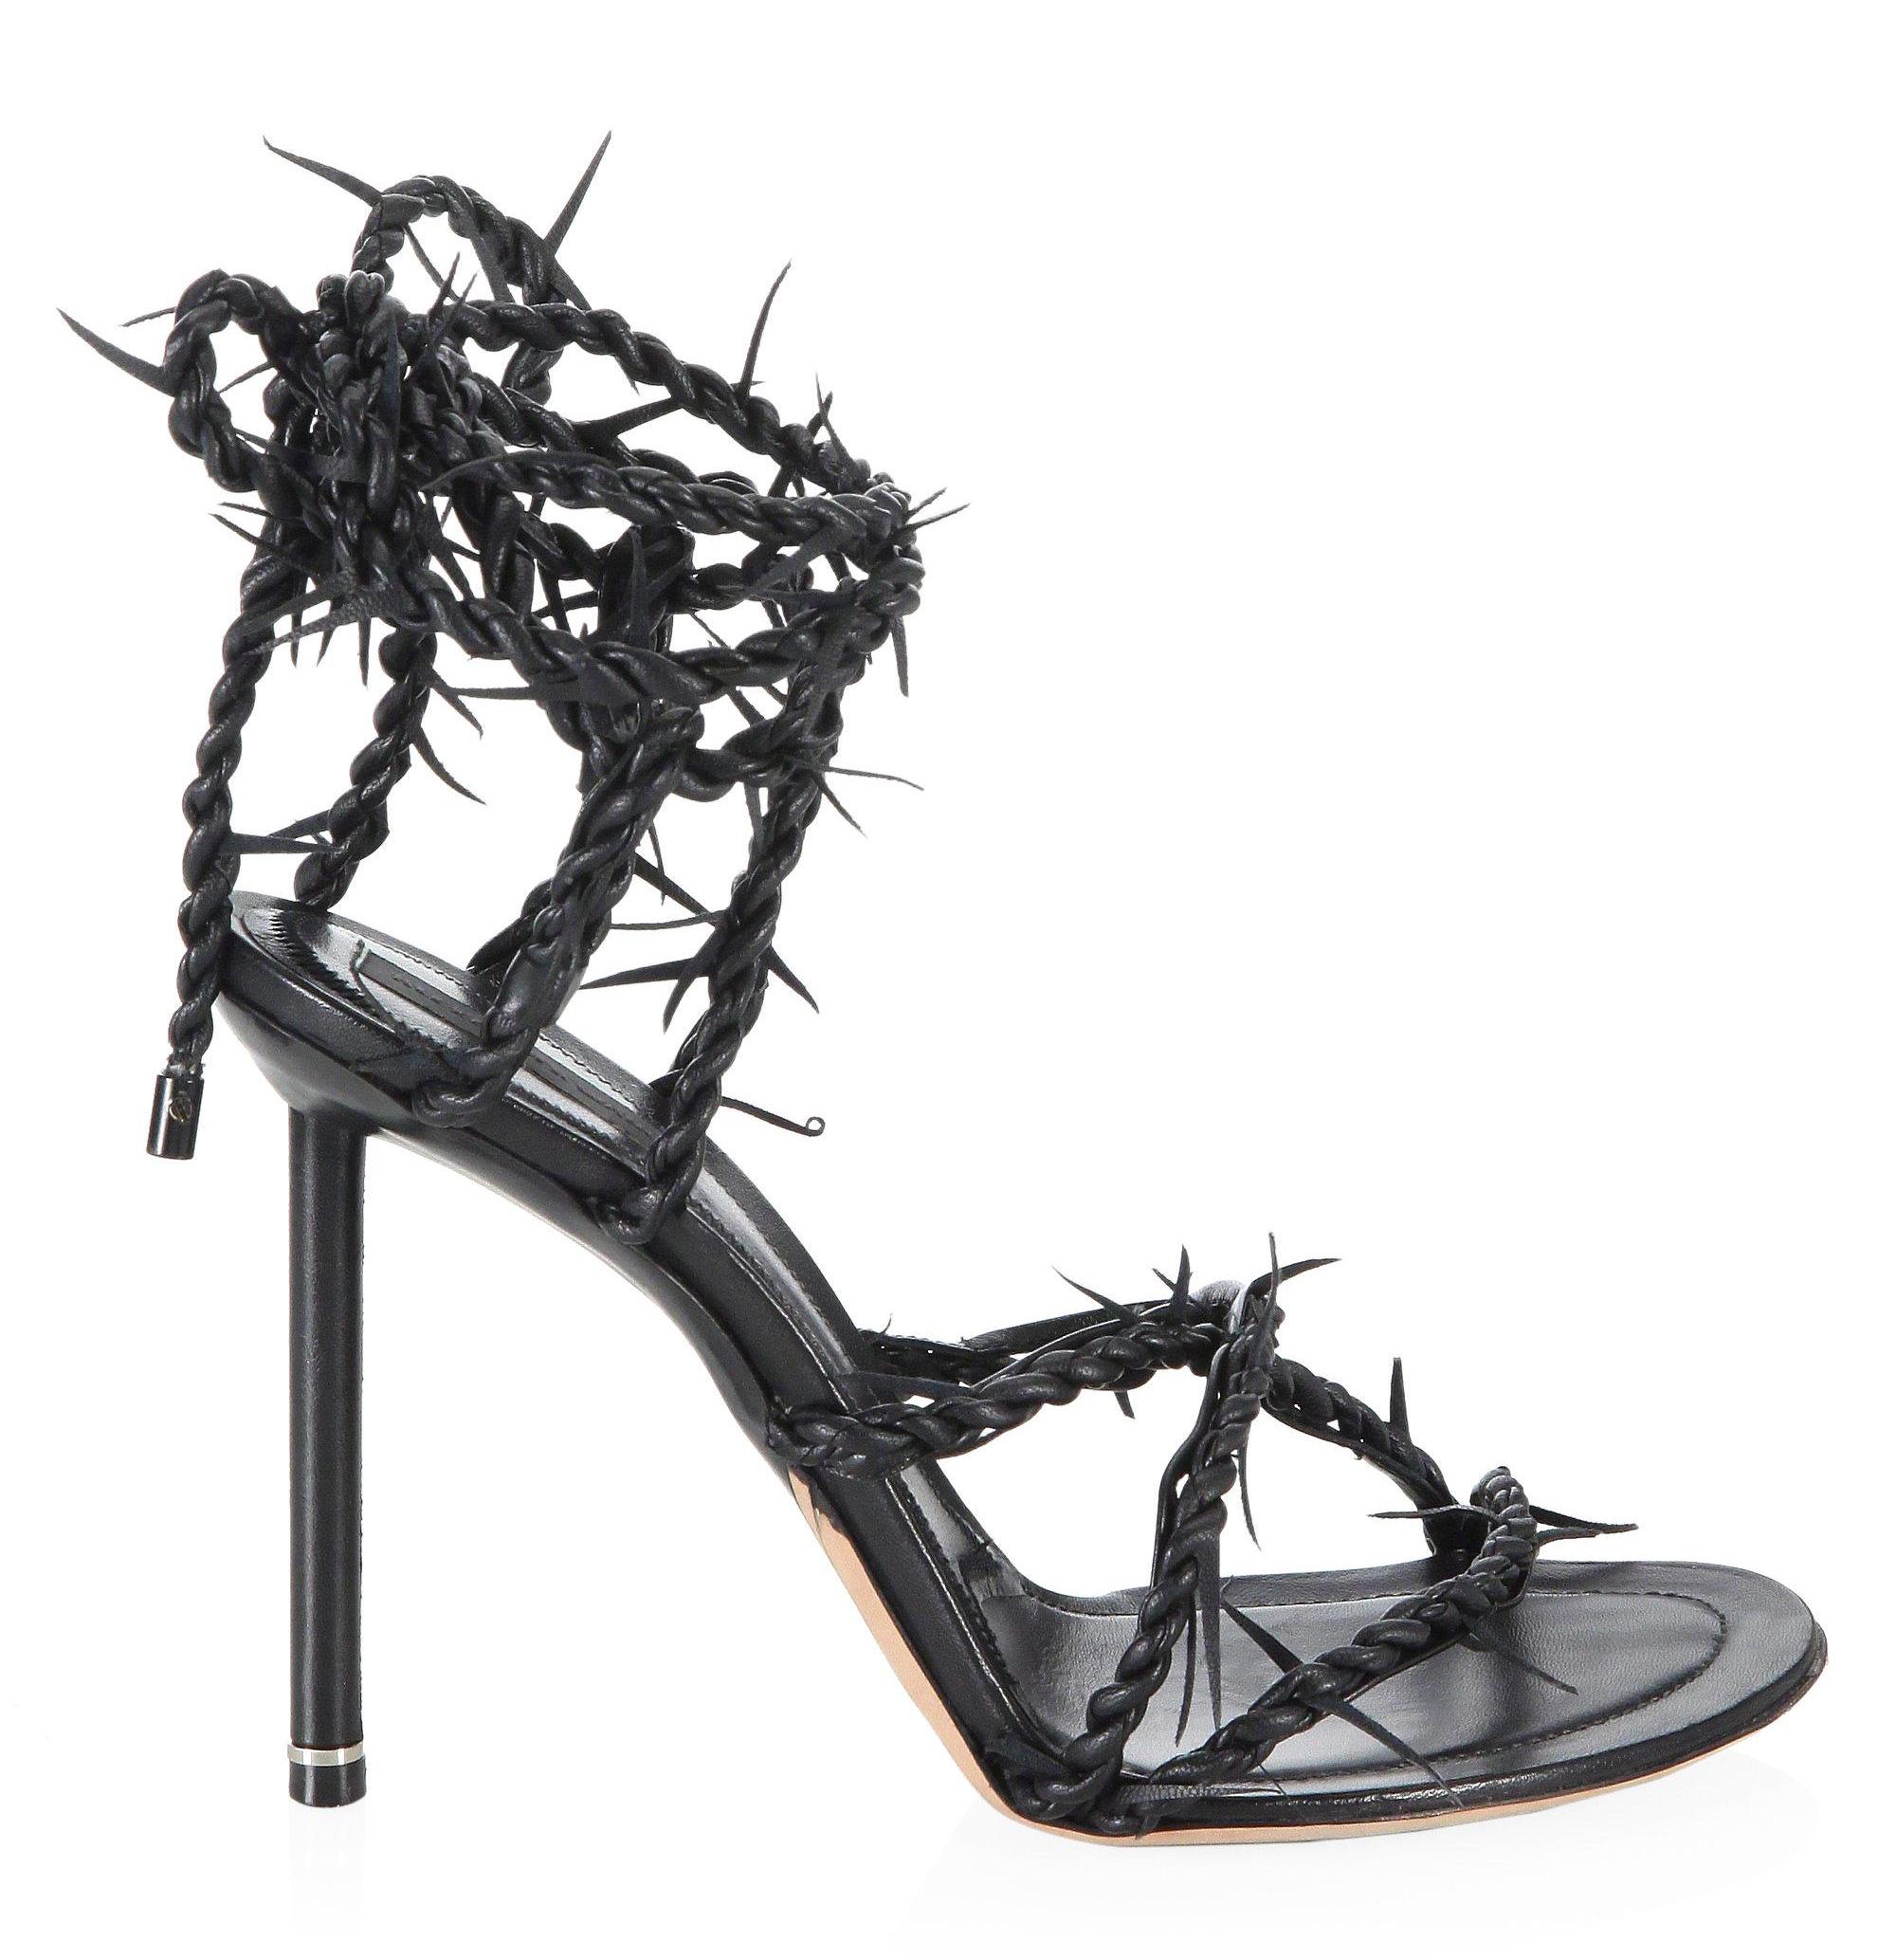 Holy Fashion: La influencia de la cultura religiosa en la industria de la moda.